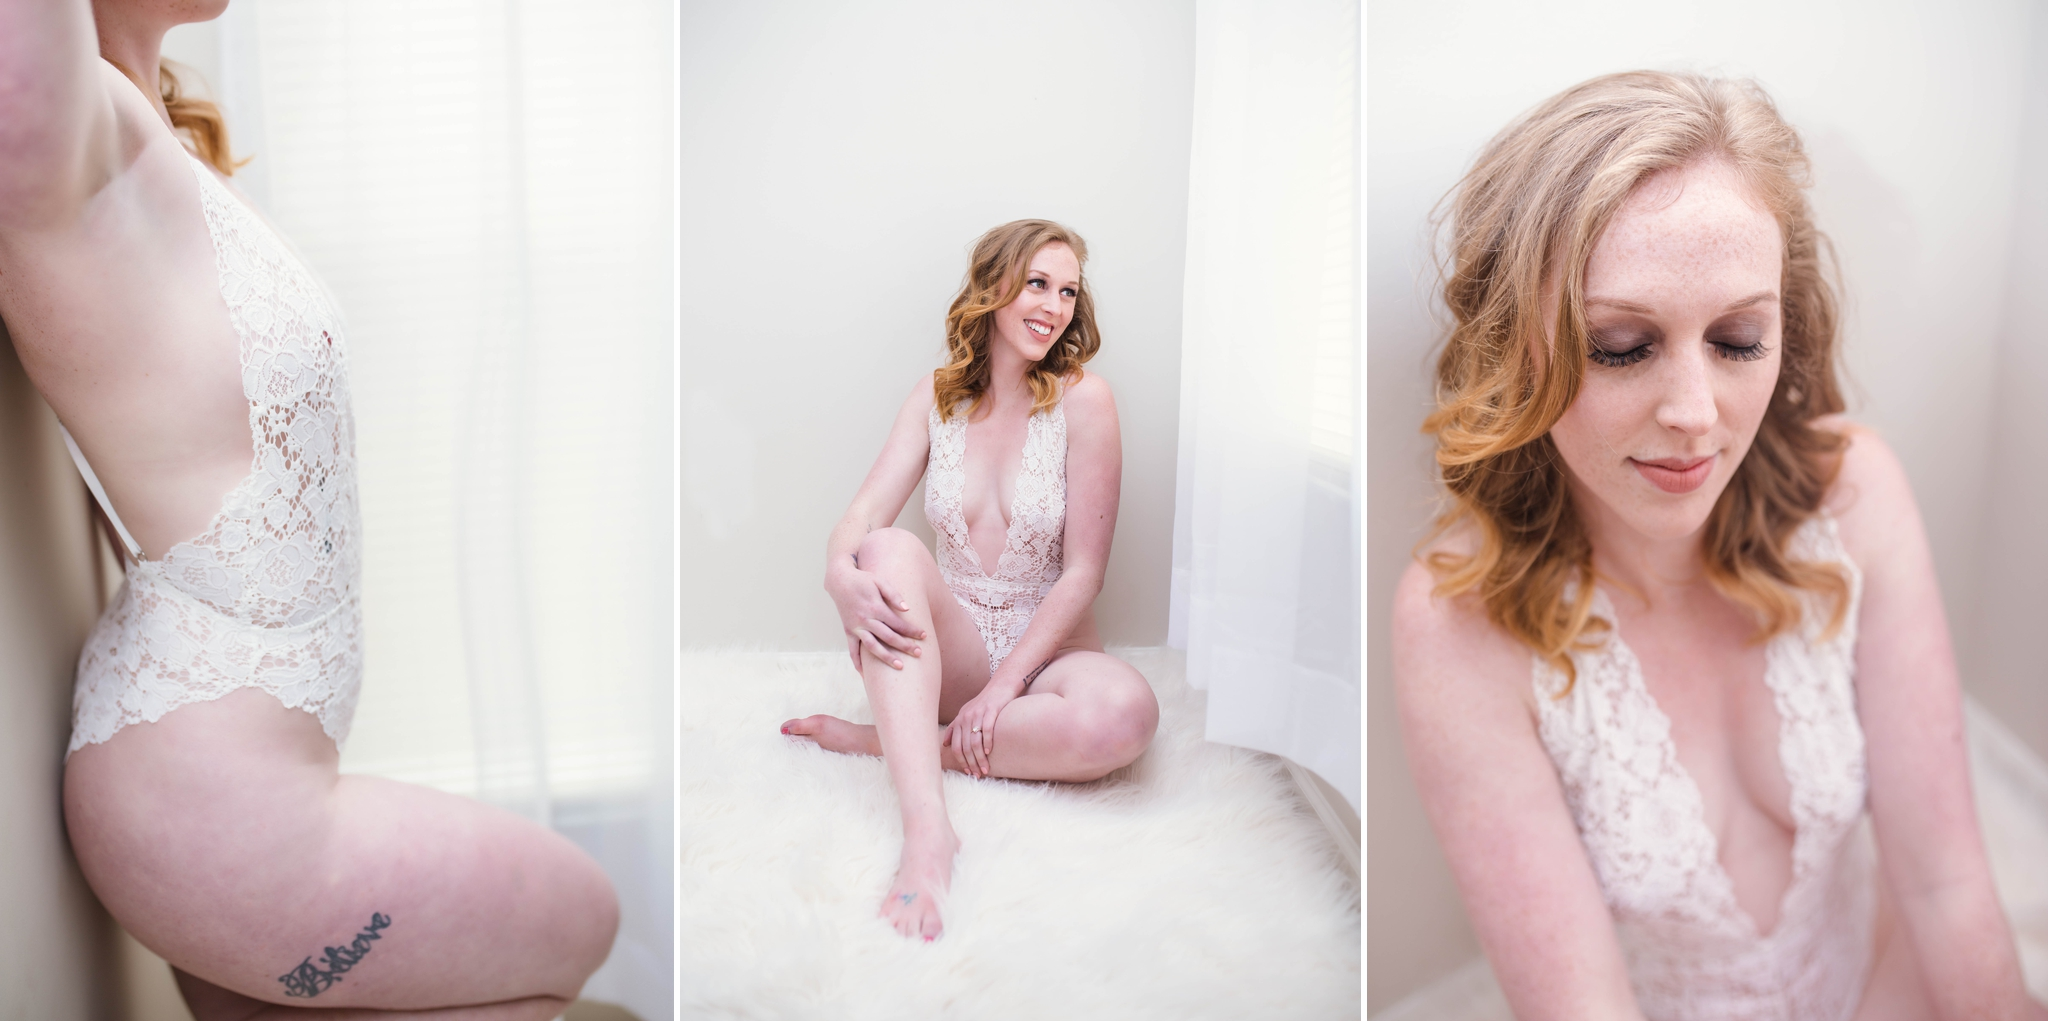 Raleigh North Carolina Female Boudoir Photographer - Johanna Dye Photography